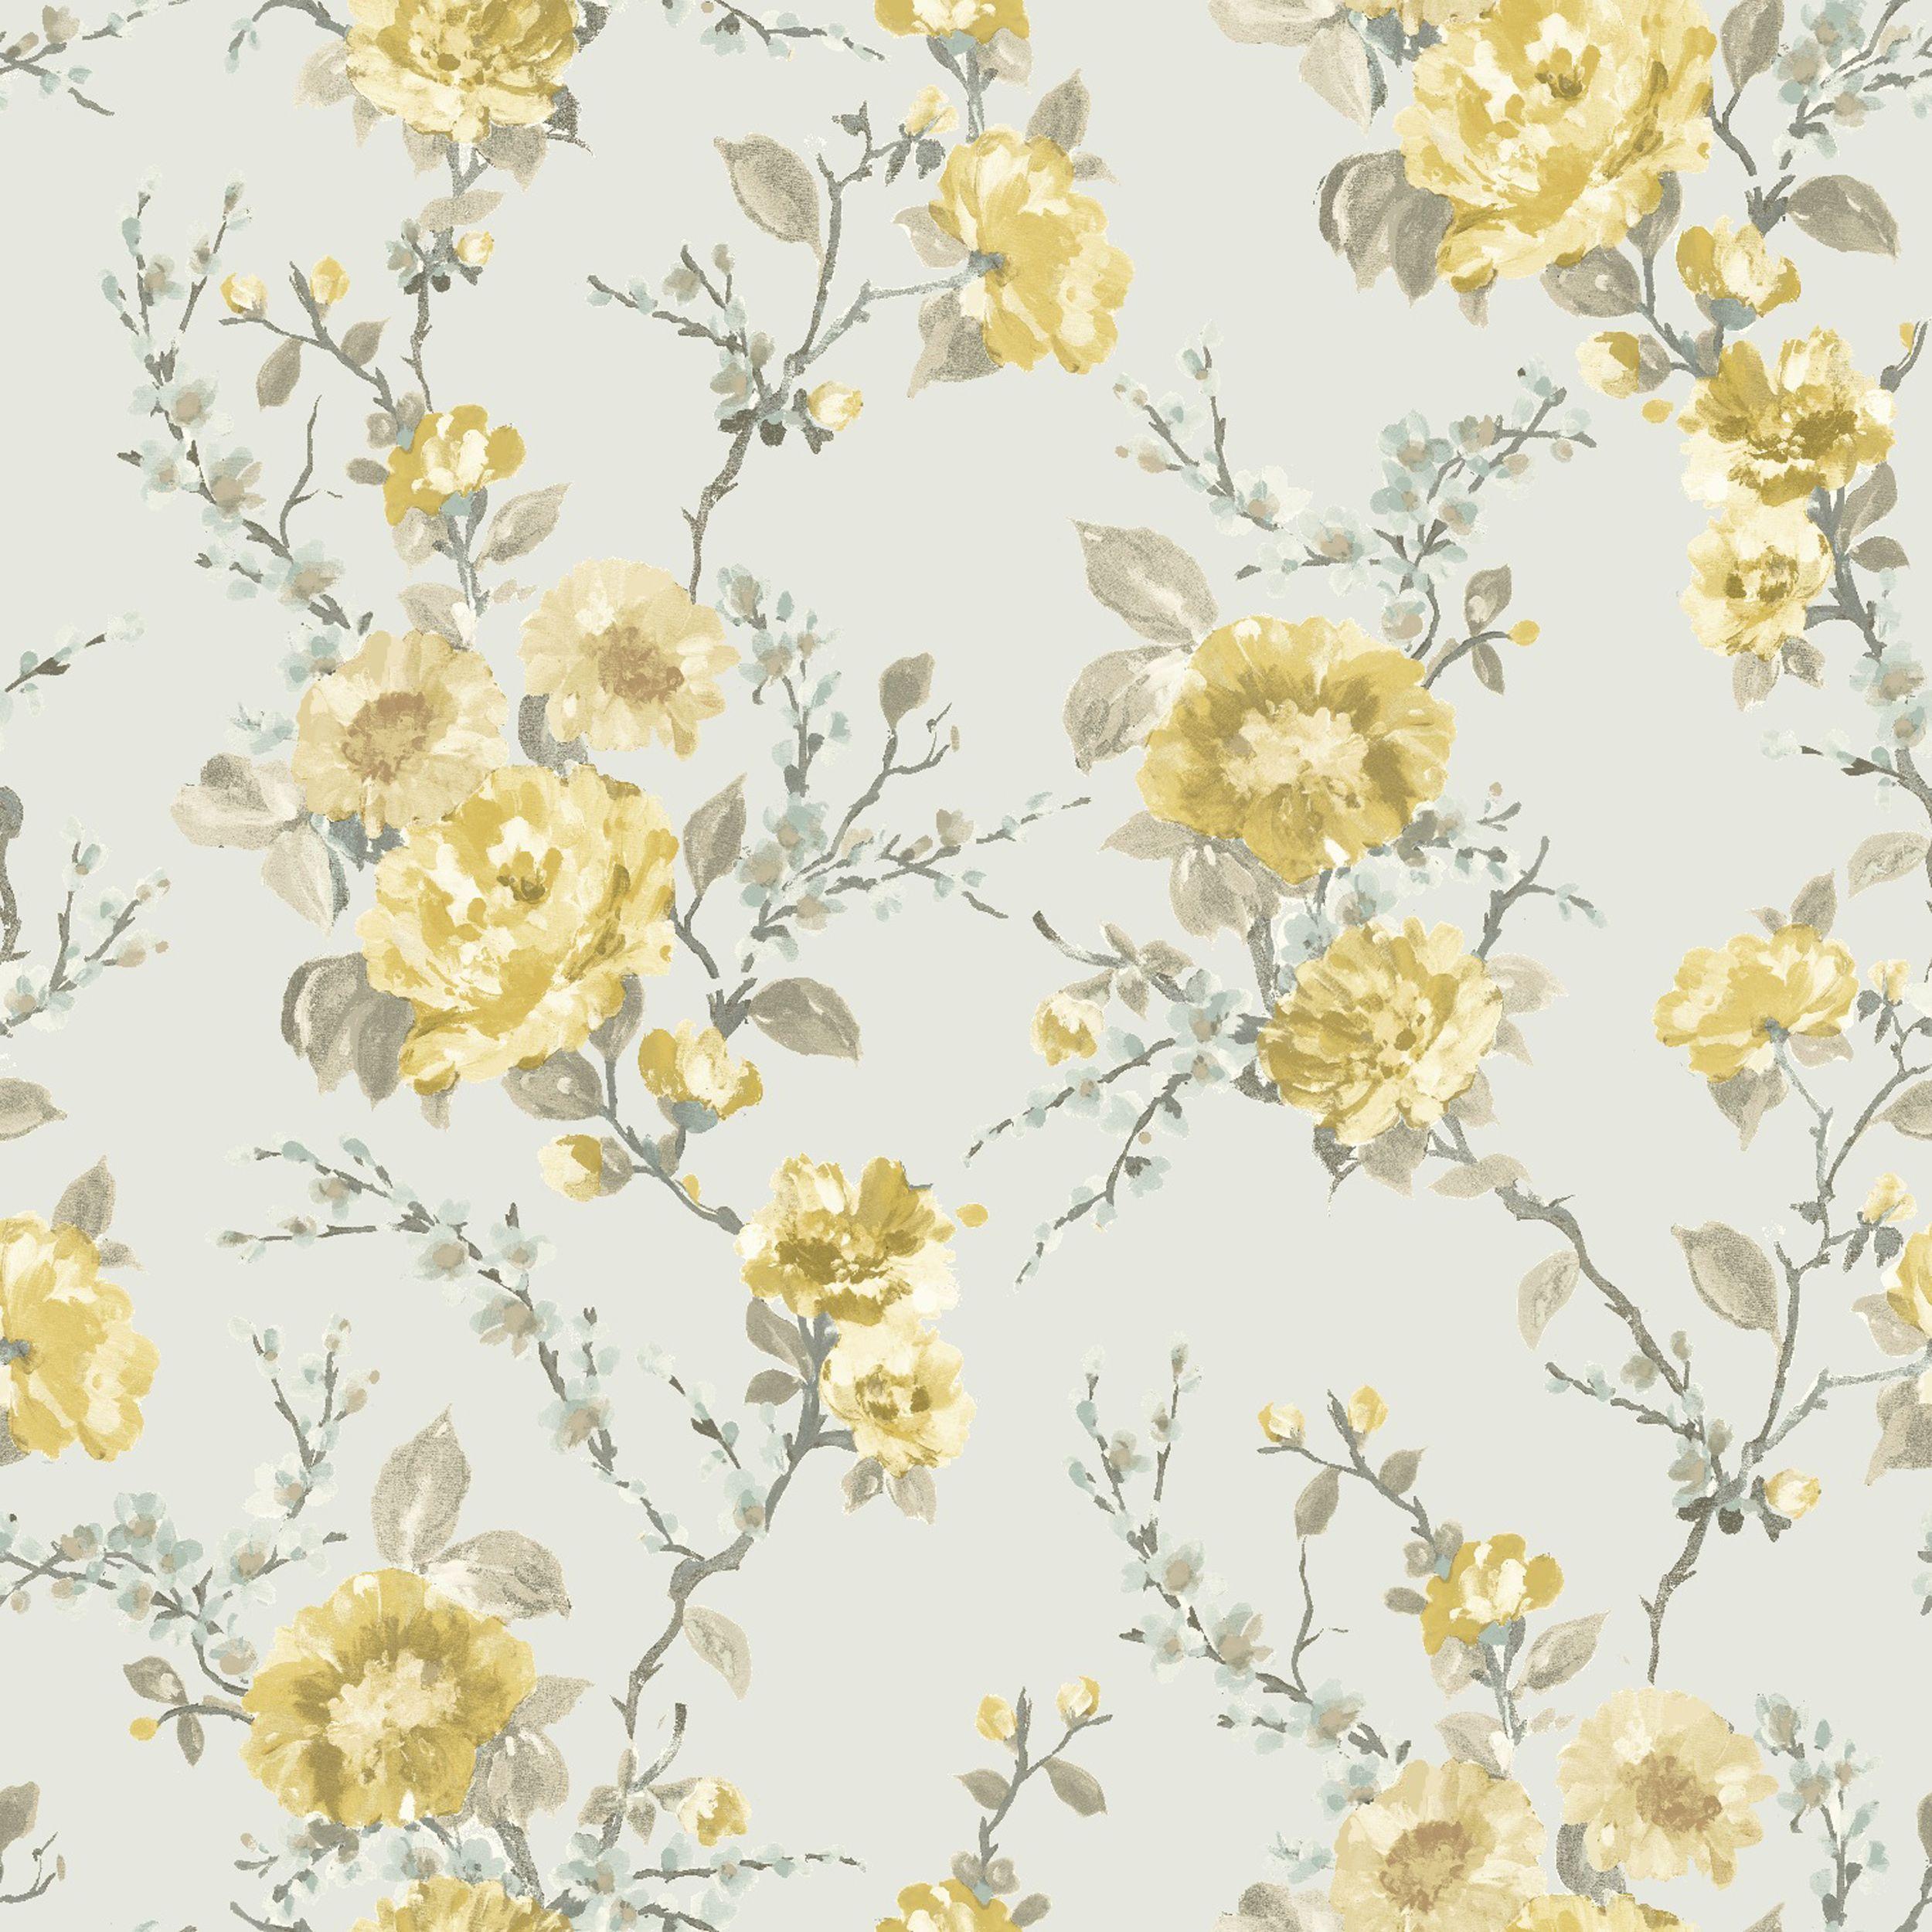 K2 Lucy Duck Egg & Yellow Floral Wallpaper Eggs, Duck